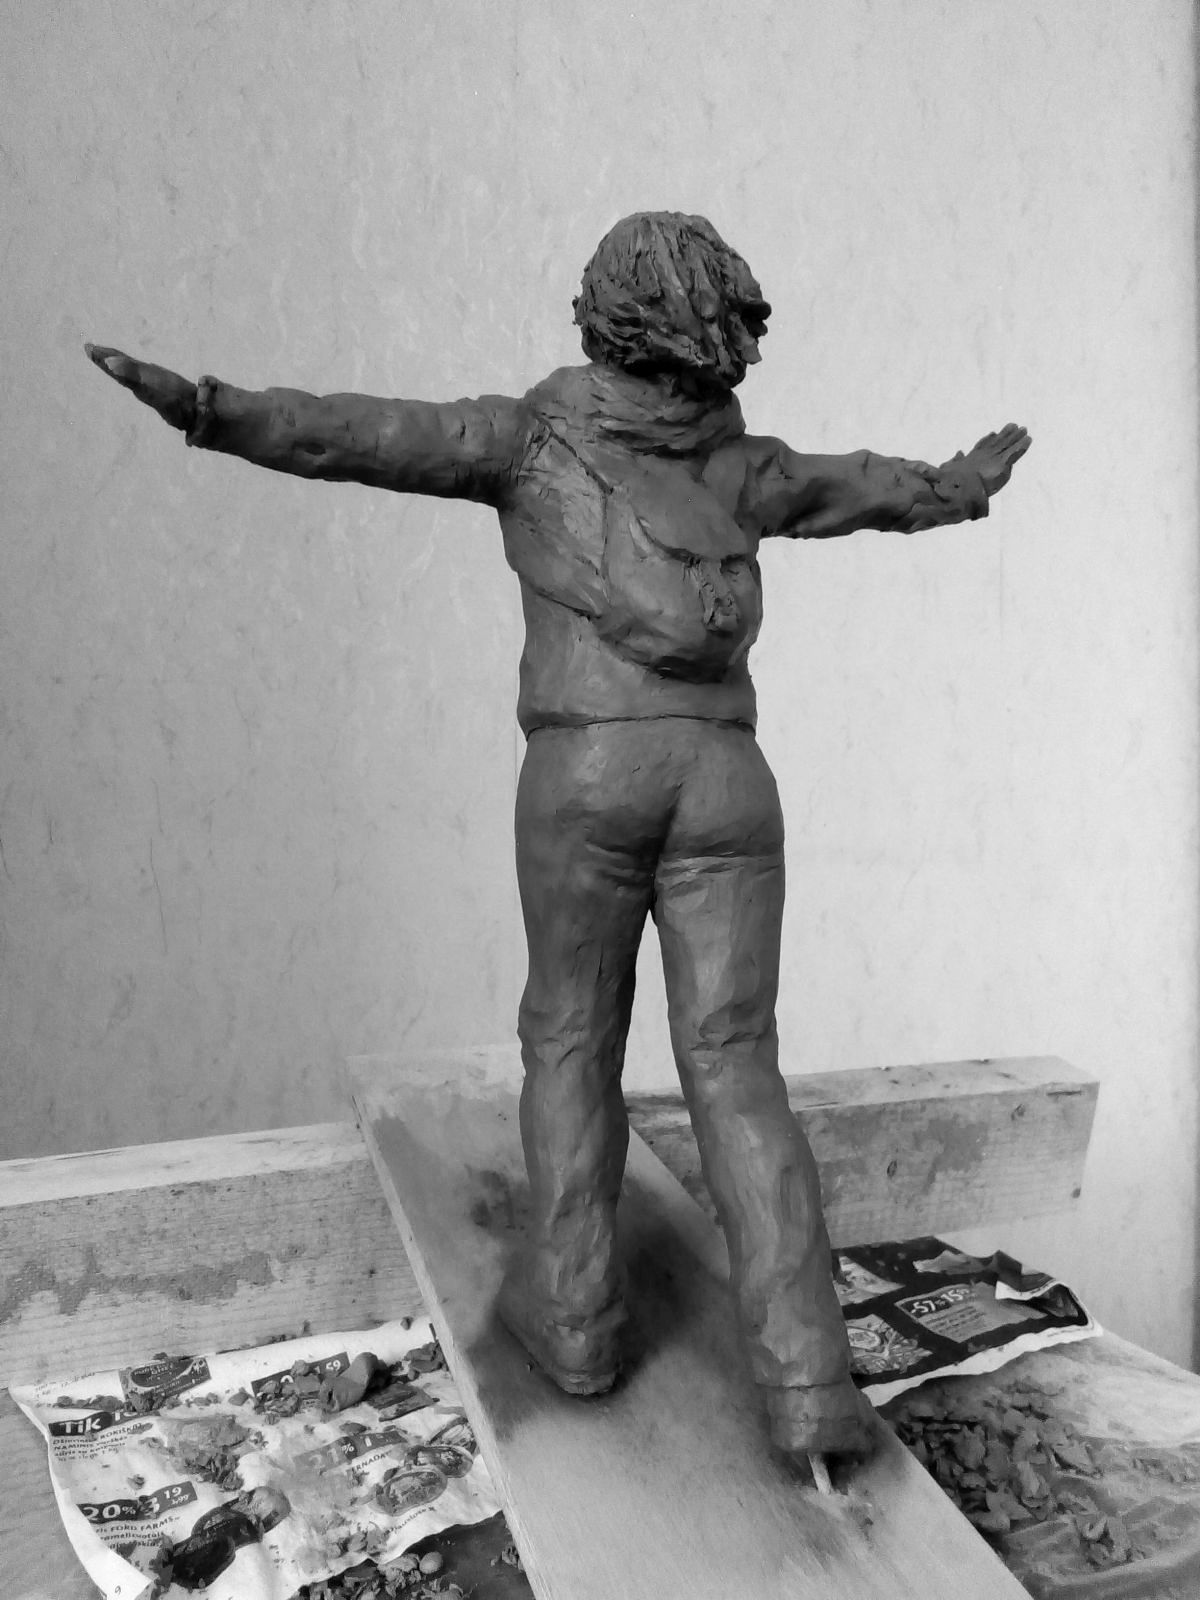 Эскиз памятника Ирине Славиной. Глина, 25 см. © Виктор Корб, 2021. Вид в три четверти, слева, сзади, снизу.